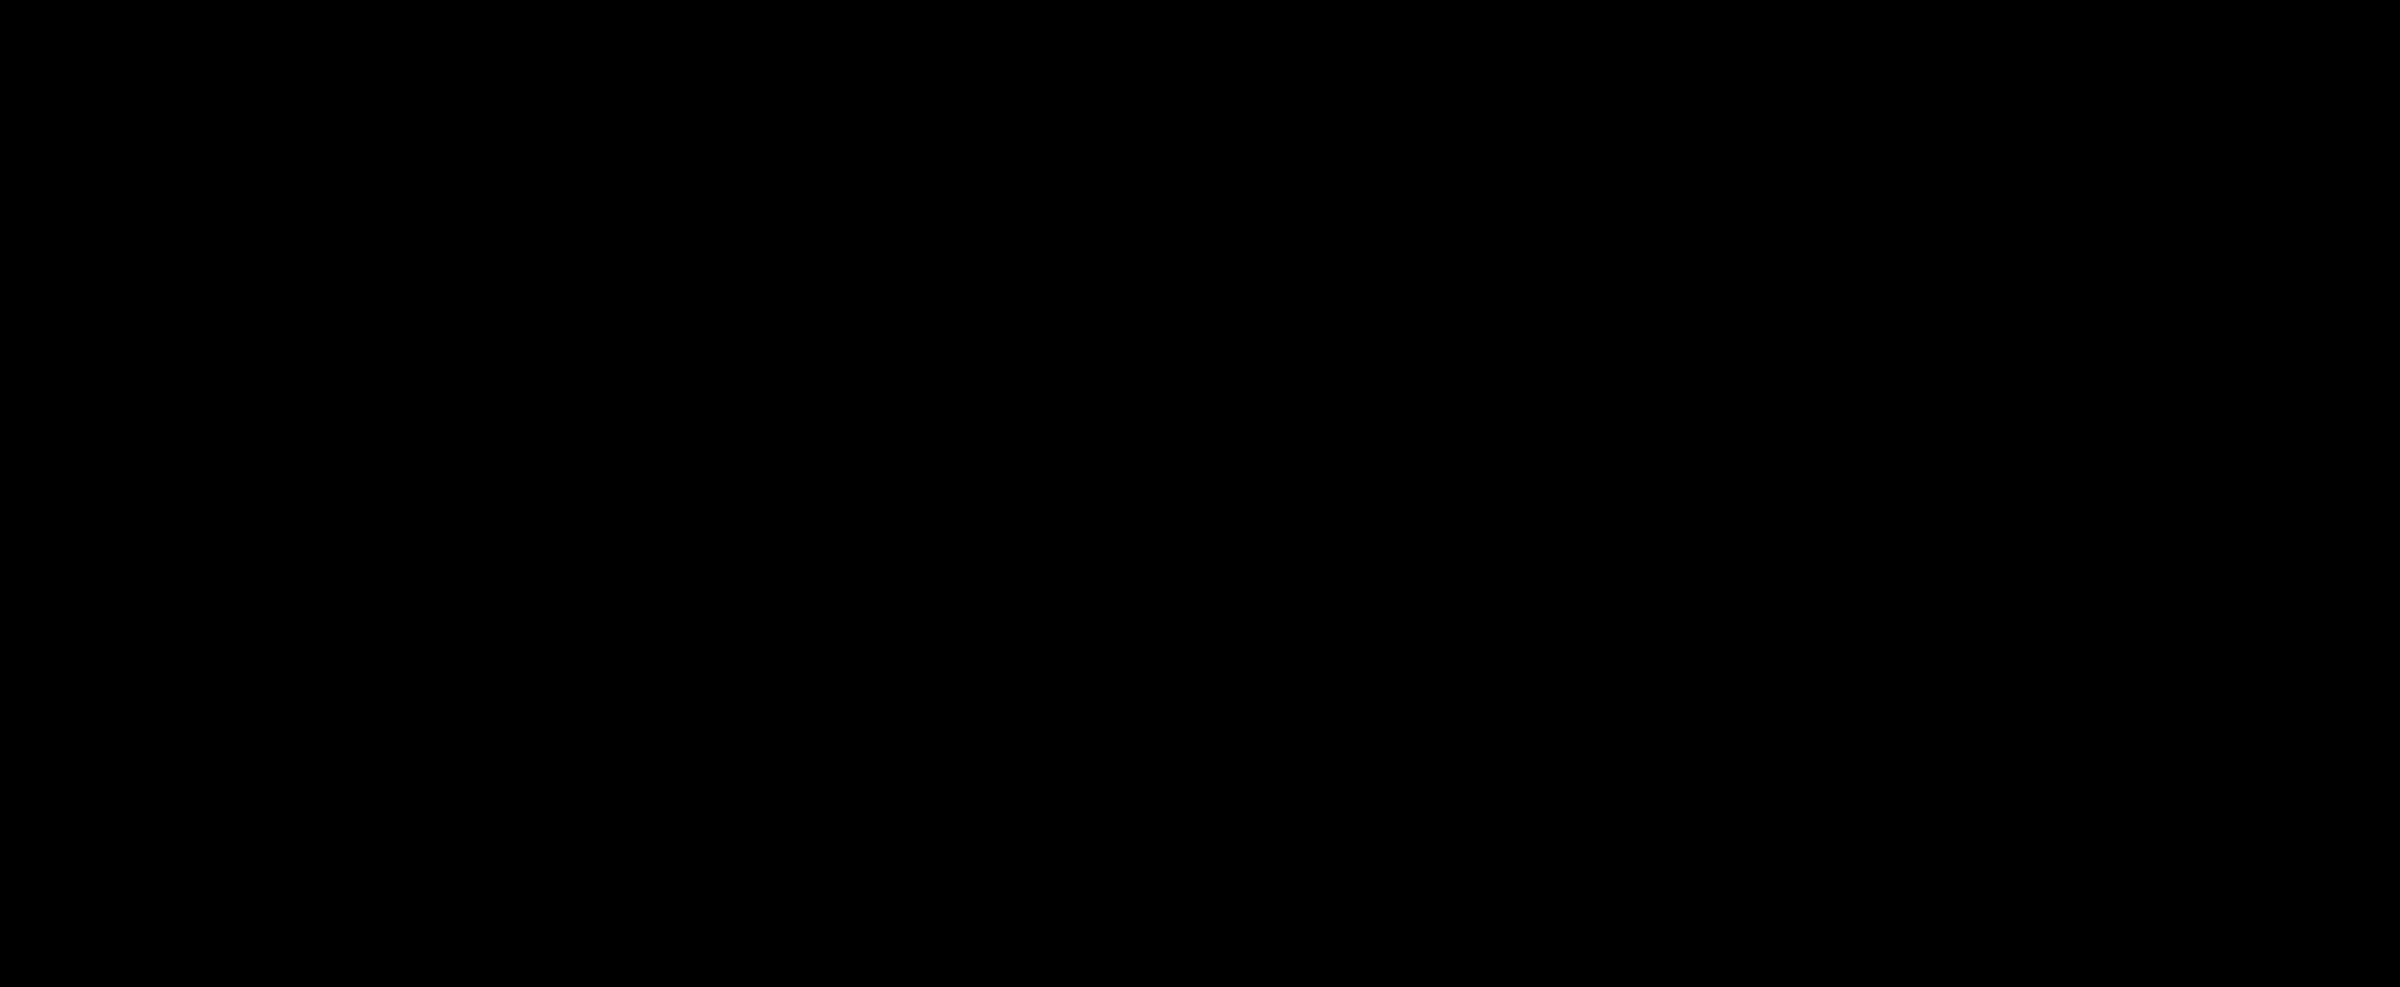 Слизень, слизняк PNG